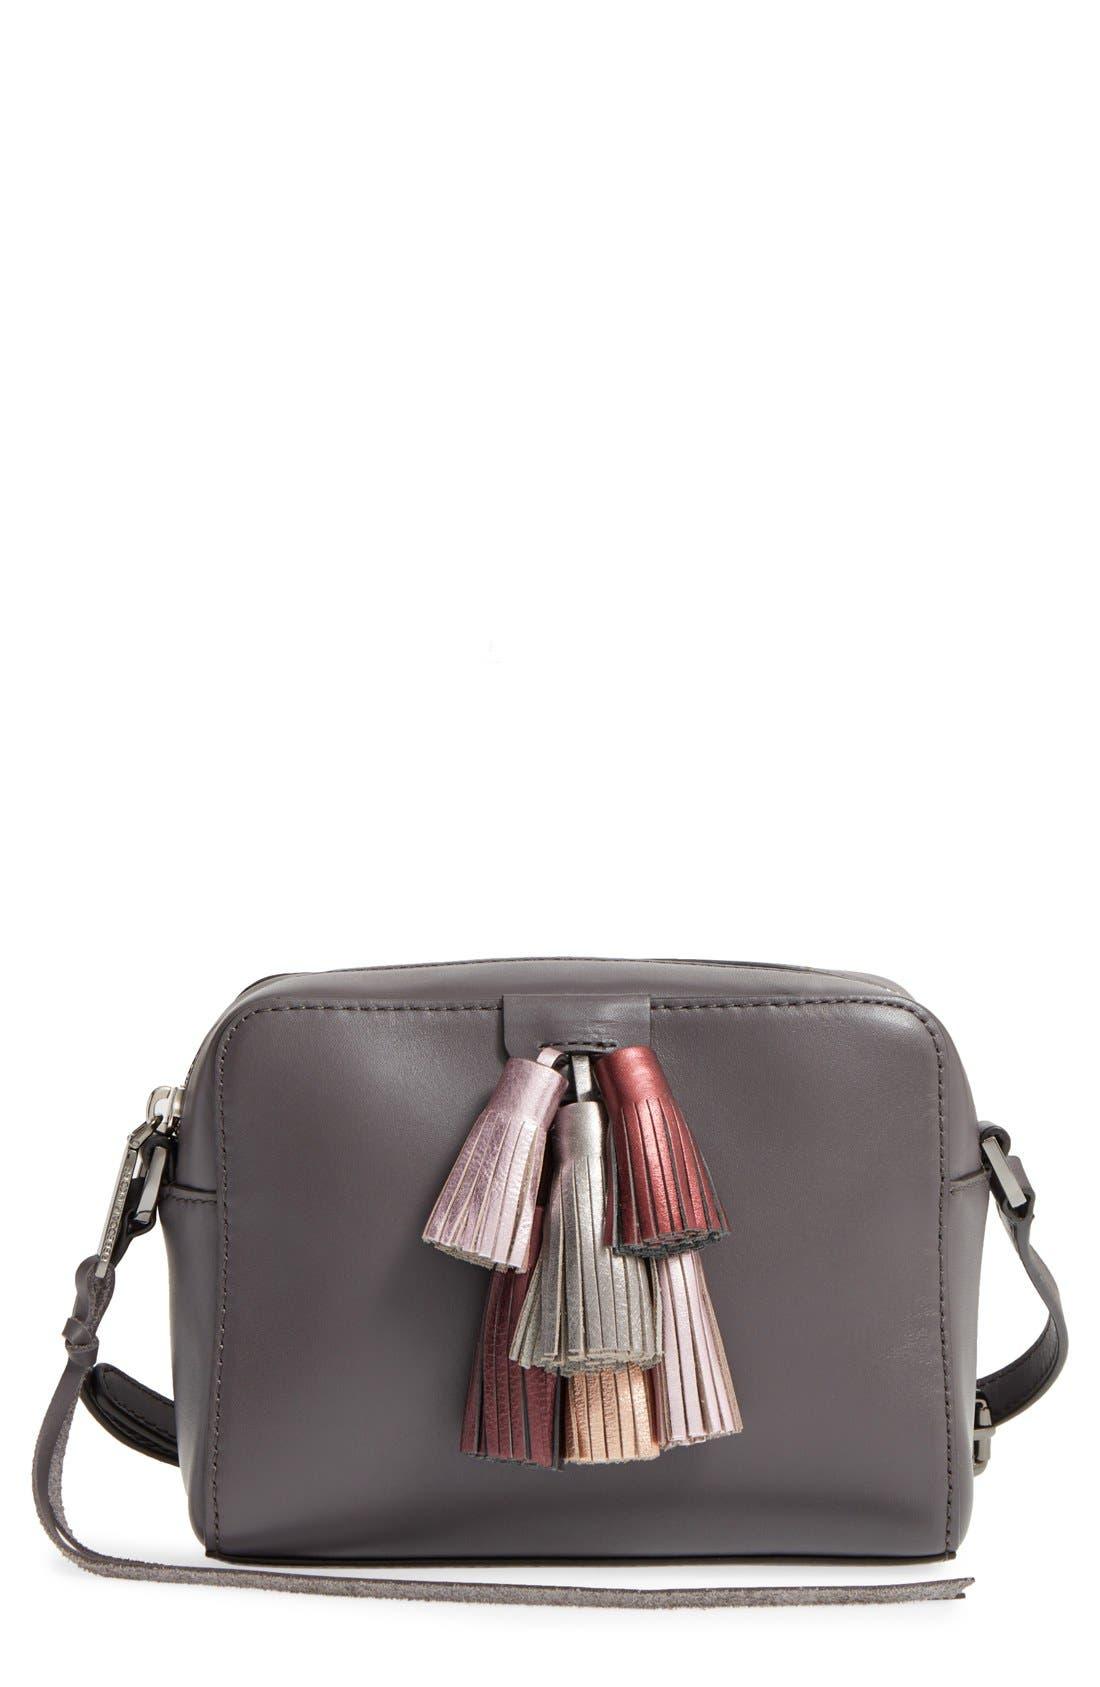 Main Image - Rebecca Minkoff Mini Sofia Leather Crossbody Bag